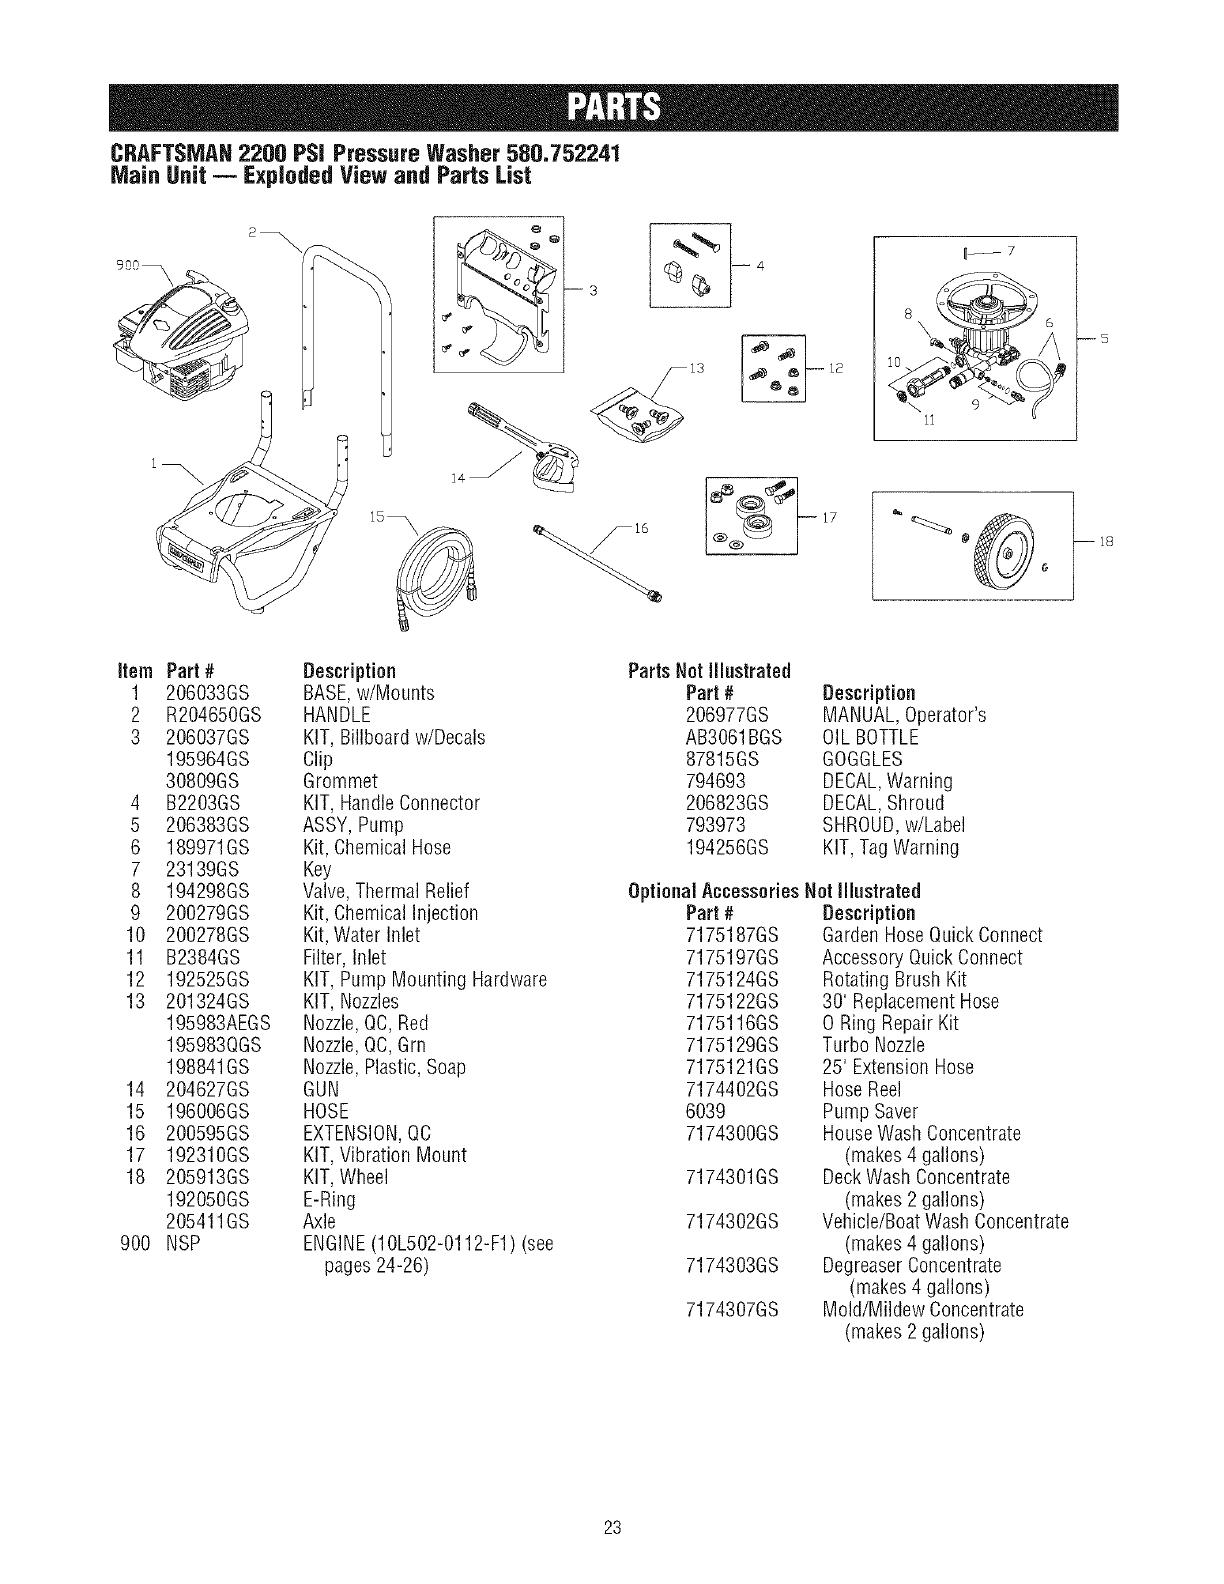 Craftsman User Manual Pressure Washer Manuals